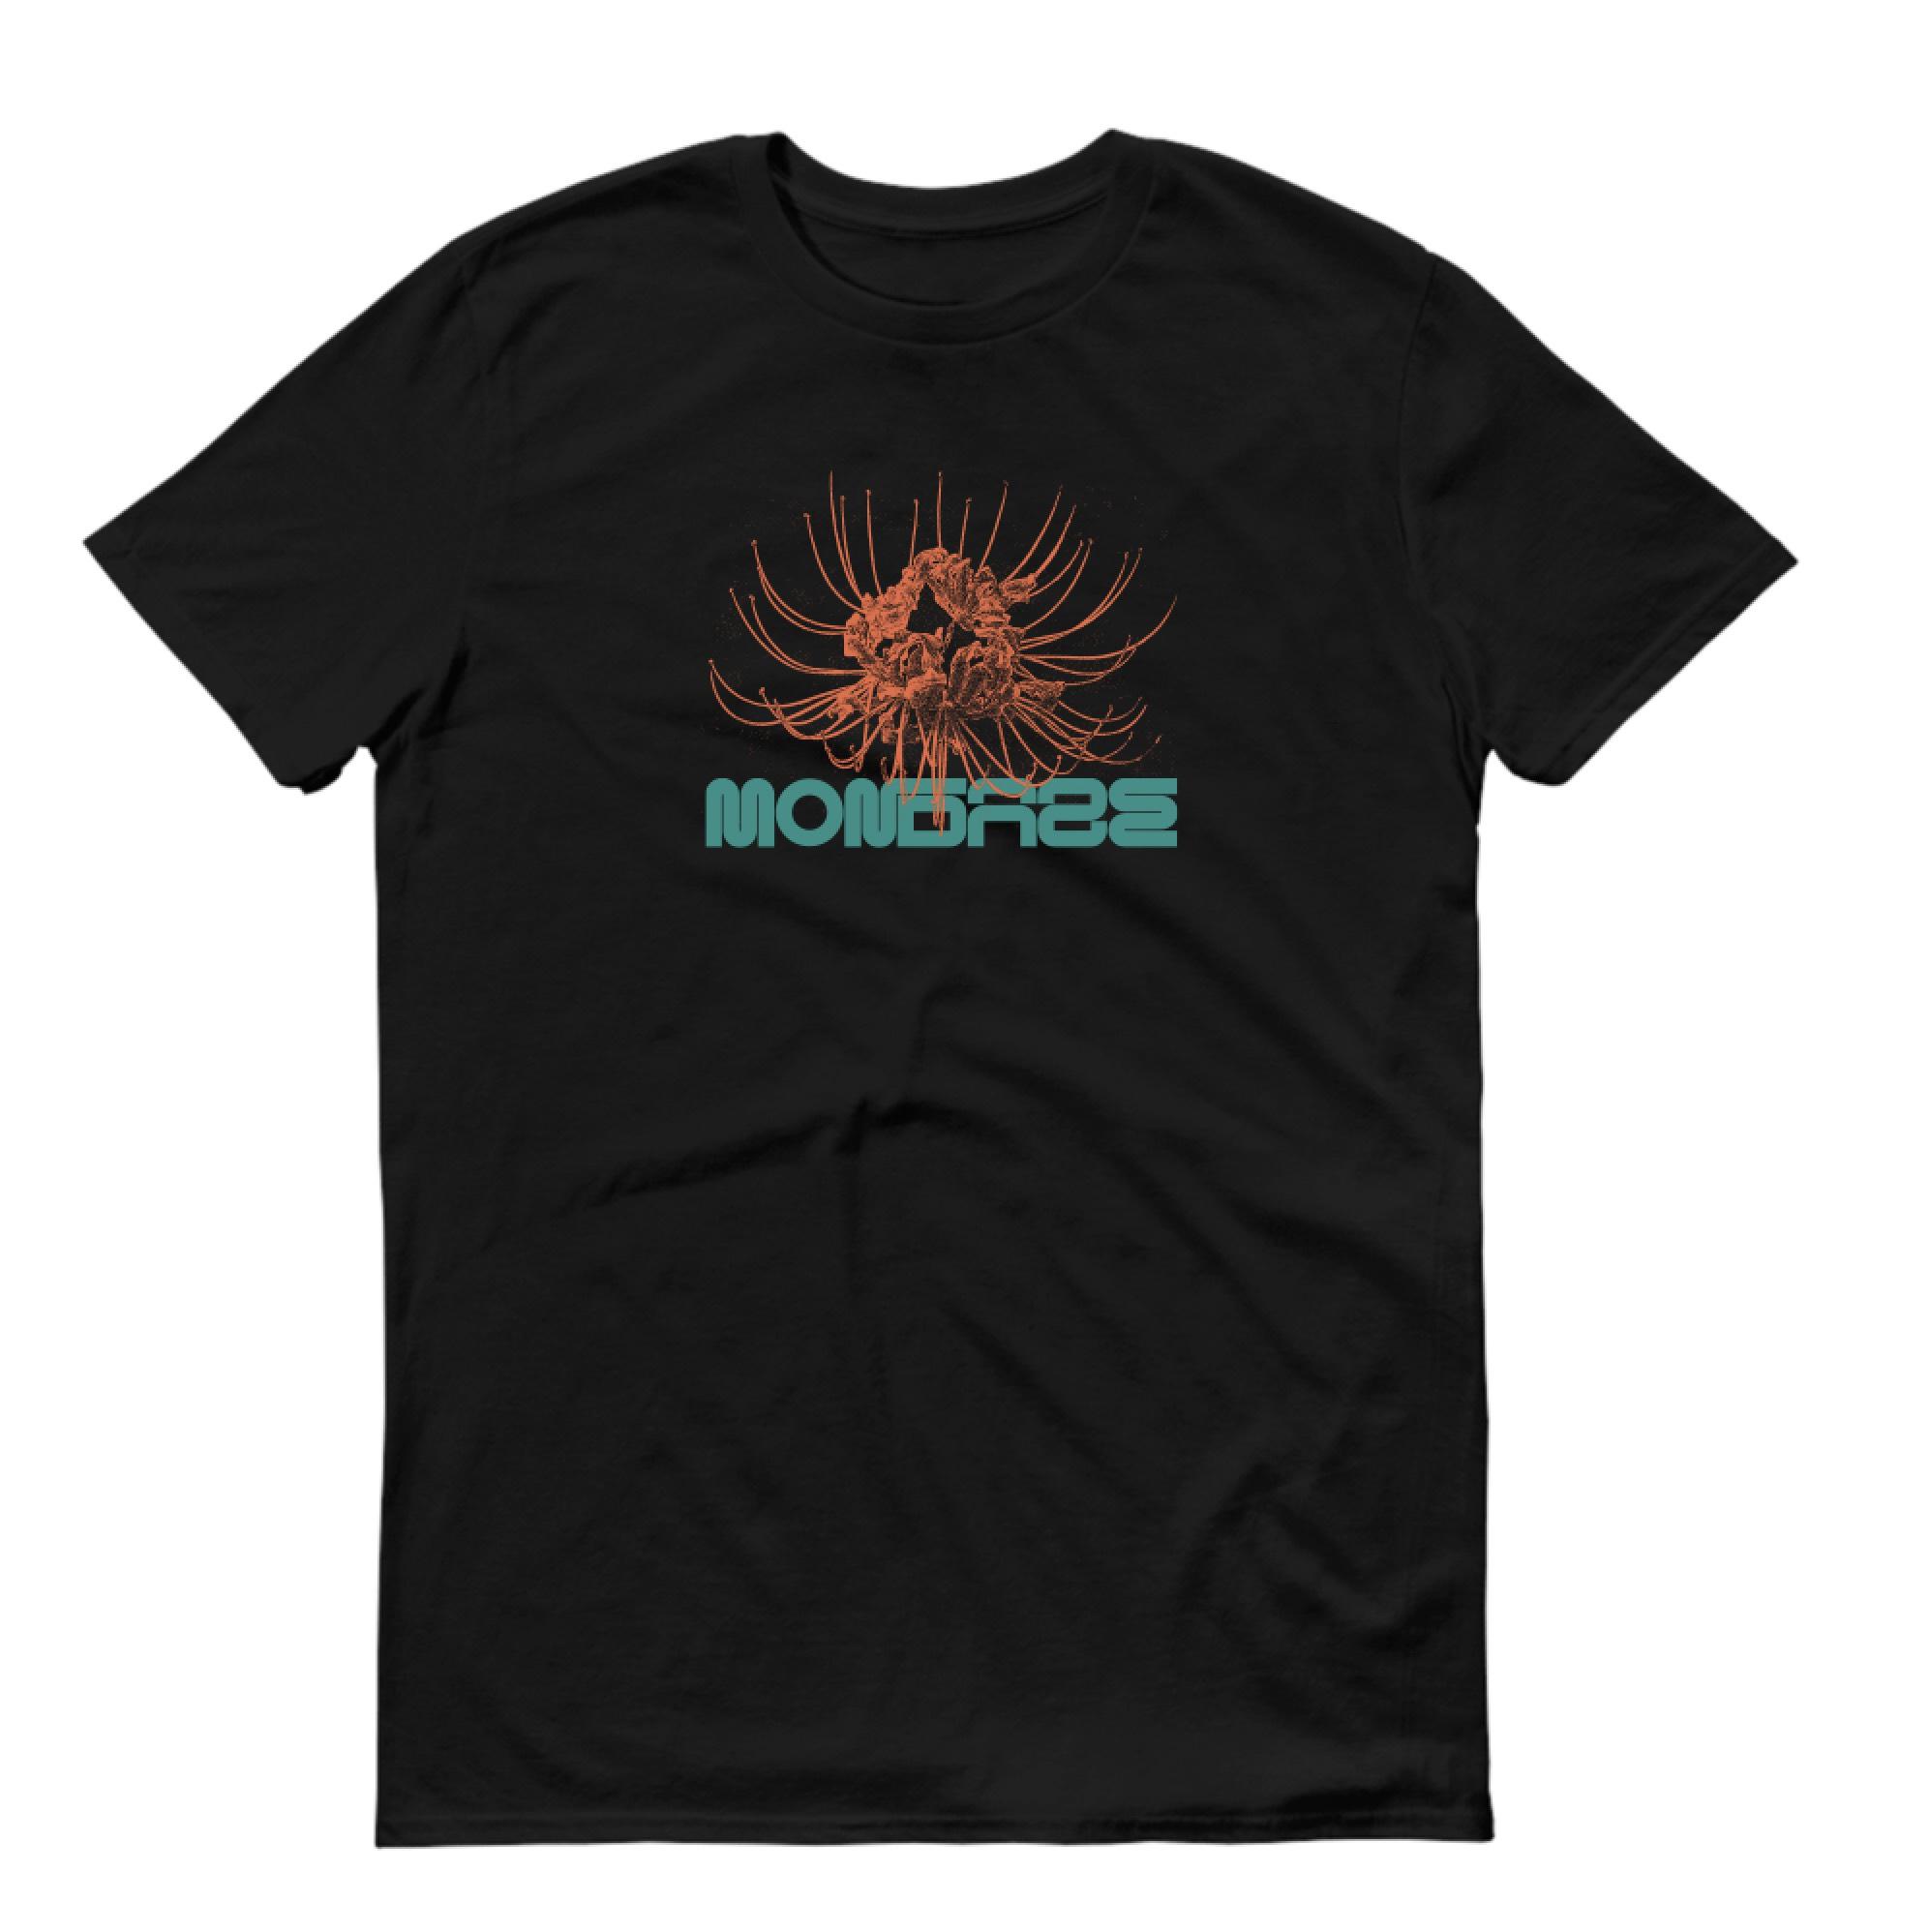 Mondaze - Late Bloom shirt PRE-ORDER